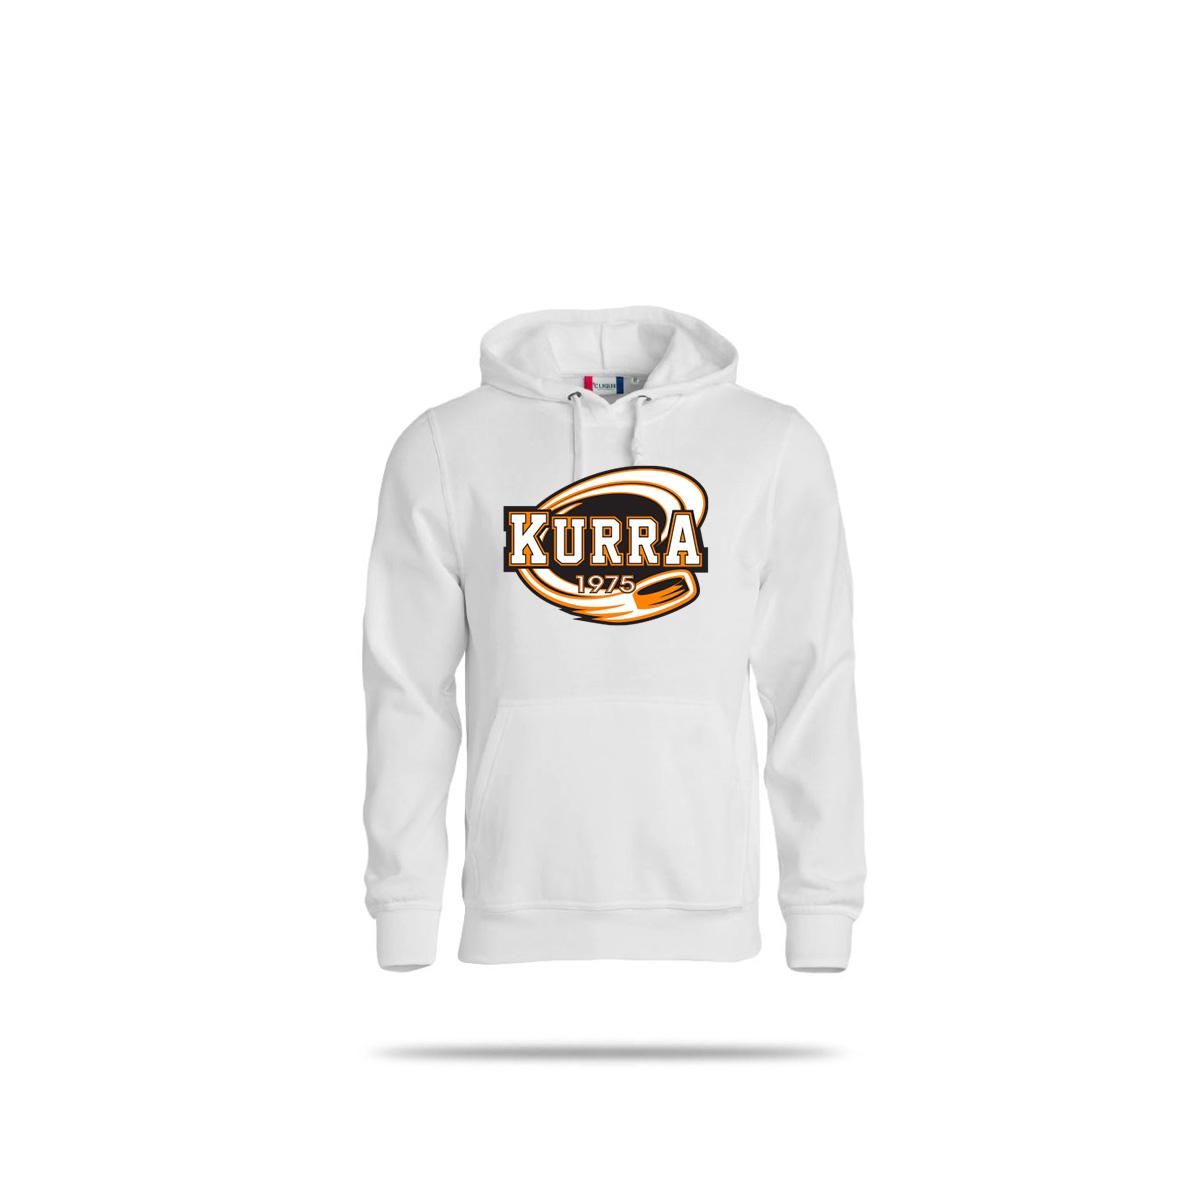 Kurra-Original-3026-valkoinen